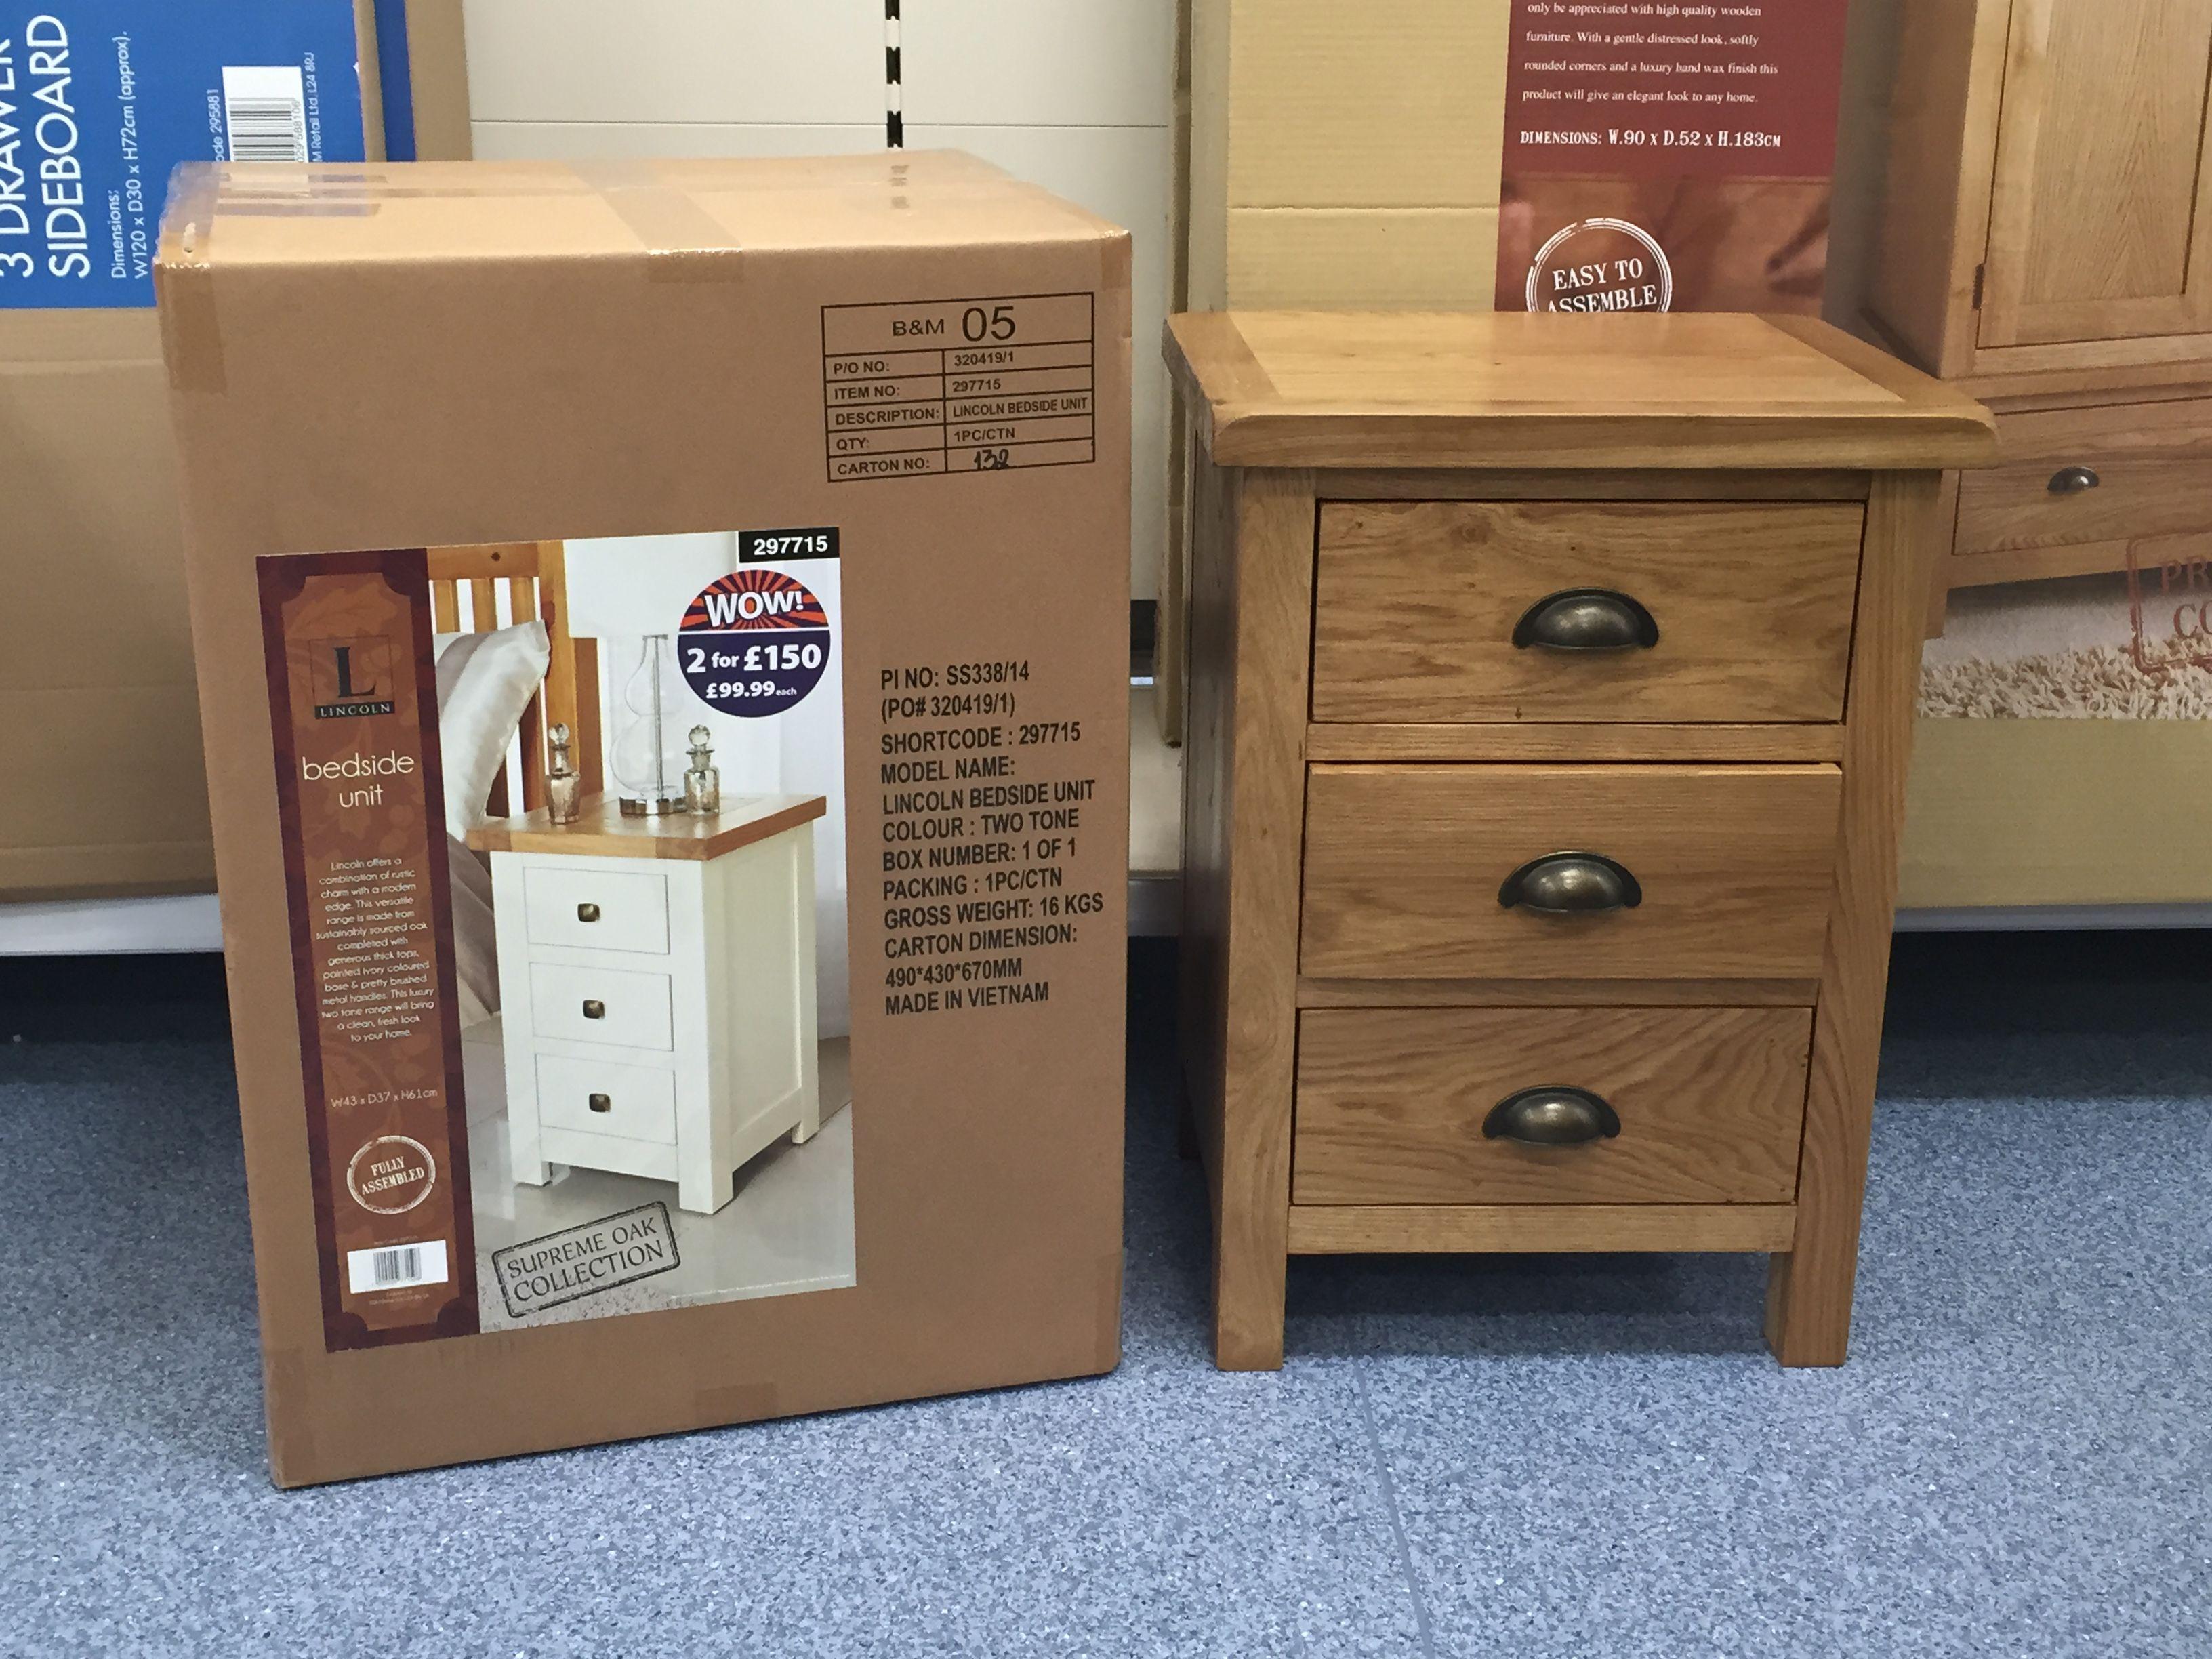 Bedside table B&M   Cheap furniture uk, Furniture, Cheap ...